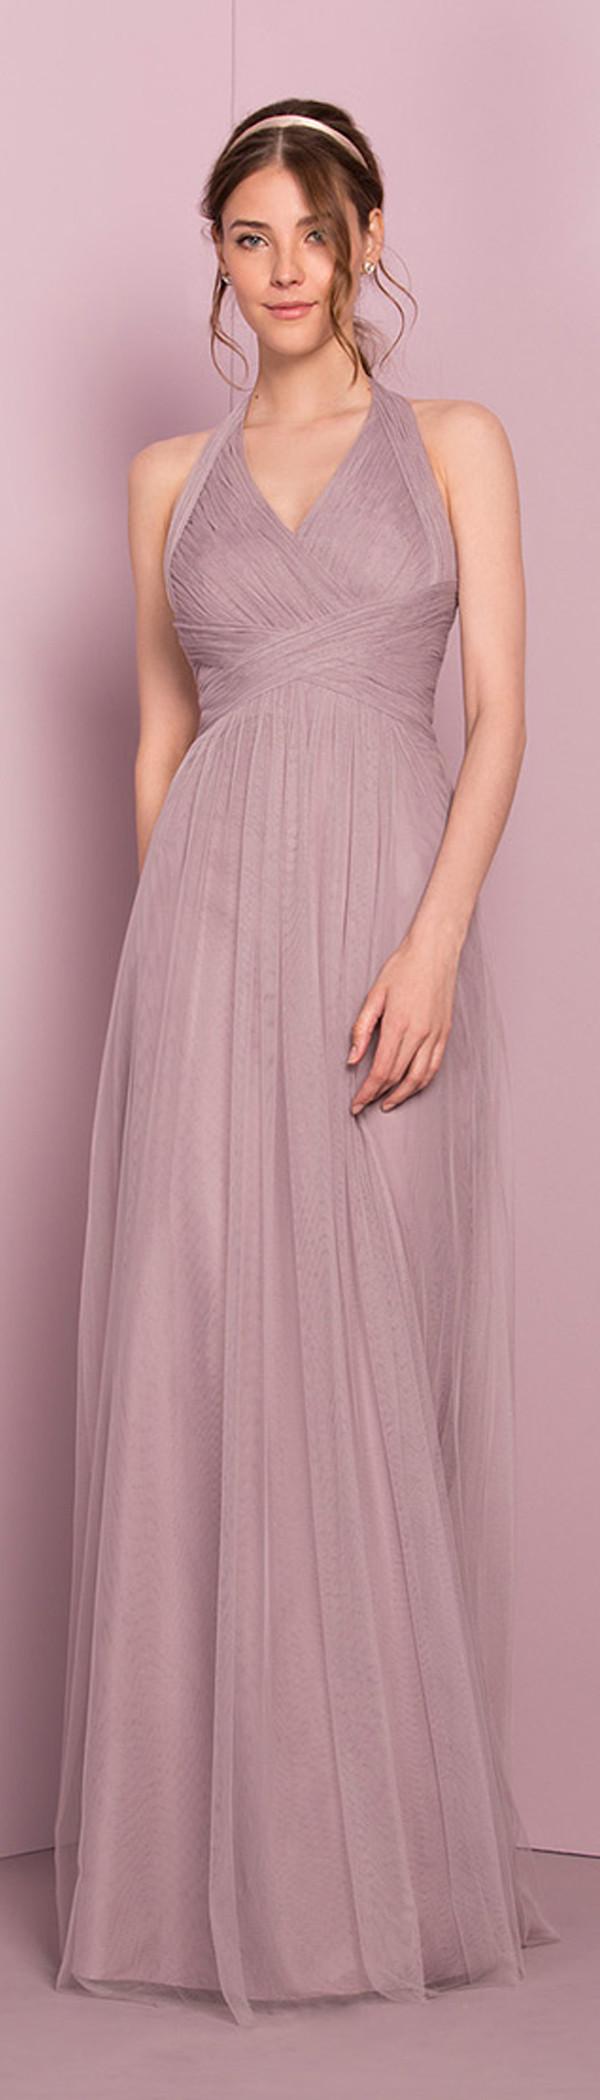 Gorgeous tulle halter neckline longlength aline bridesmaide dress